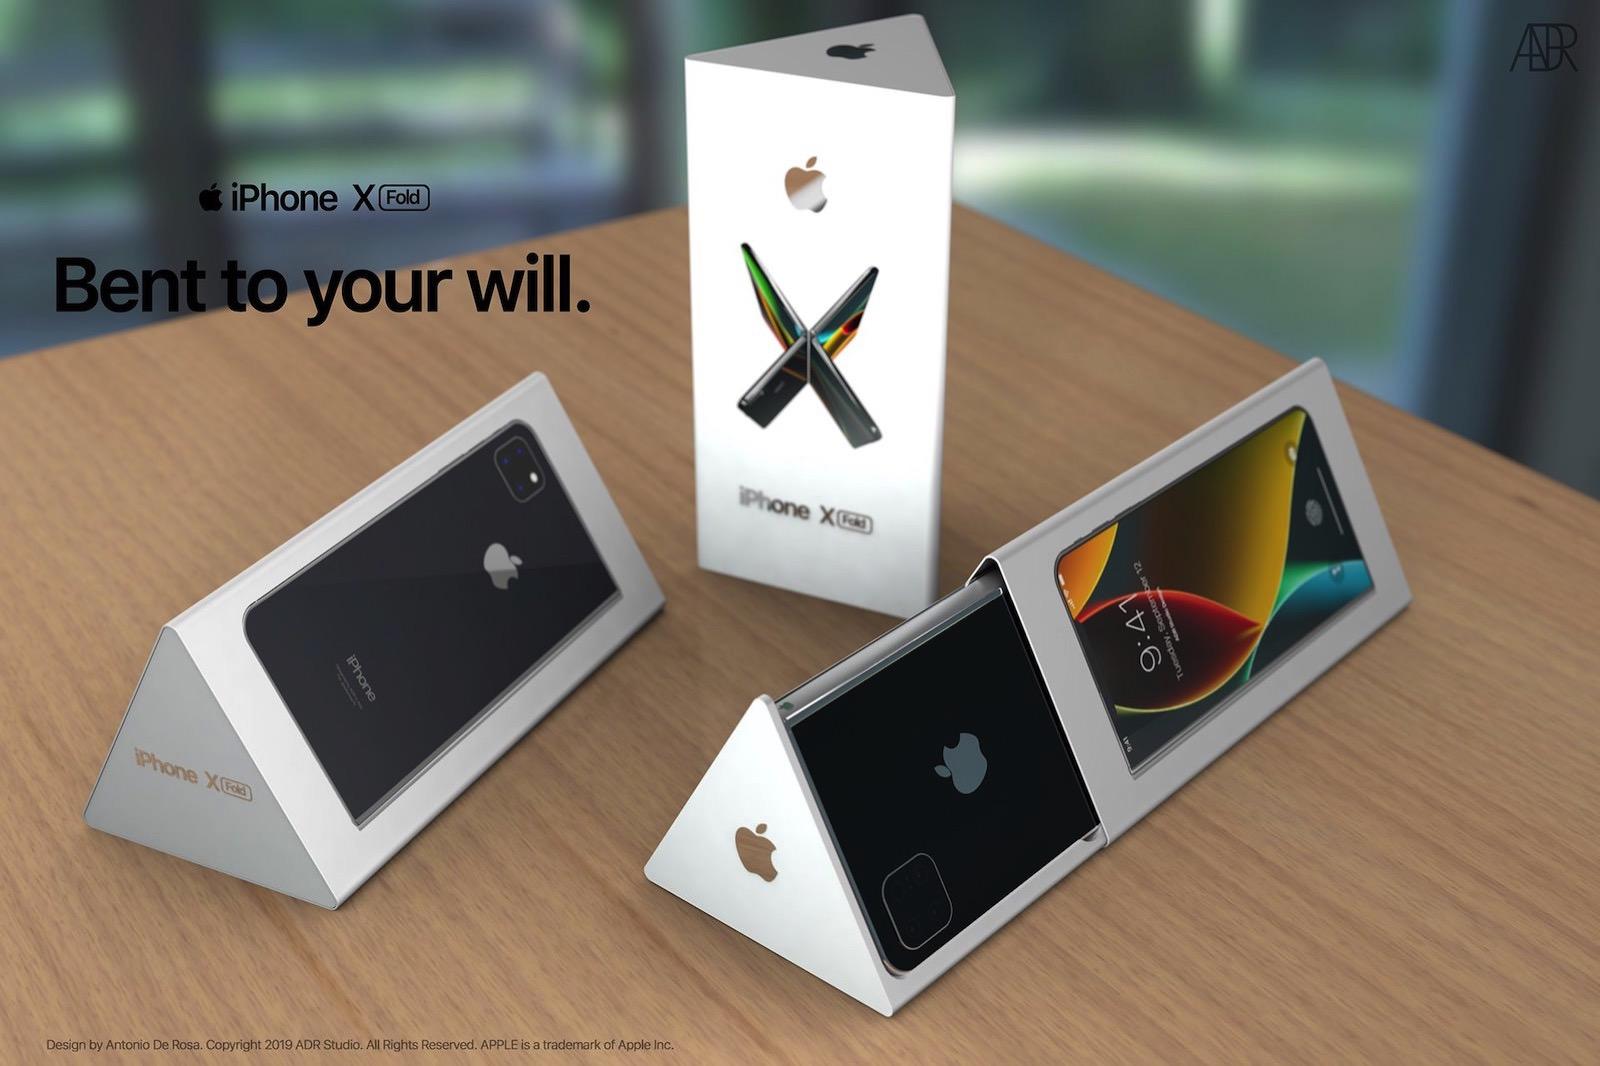 iphone-x-fold-concept-image-3.jpg